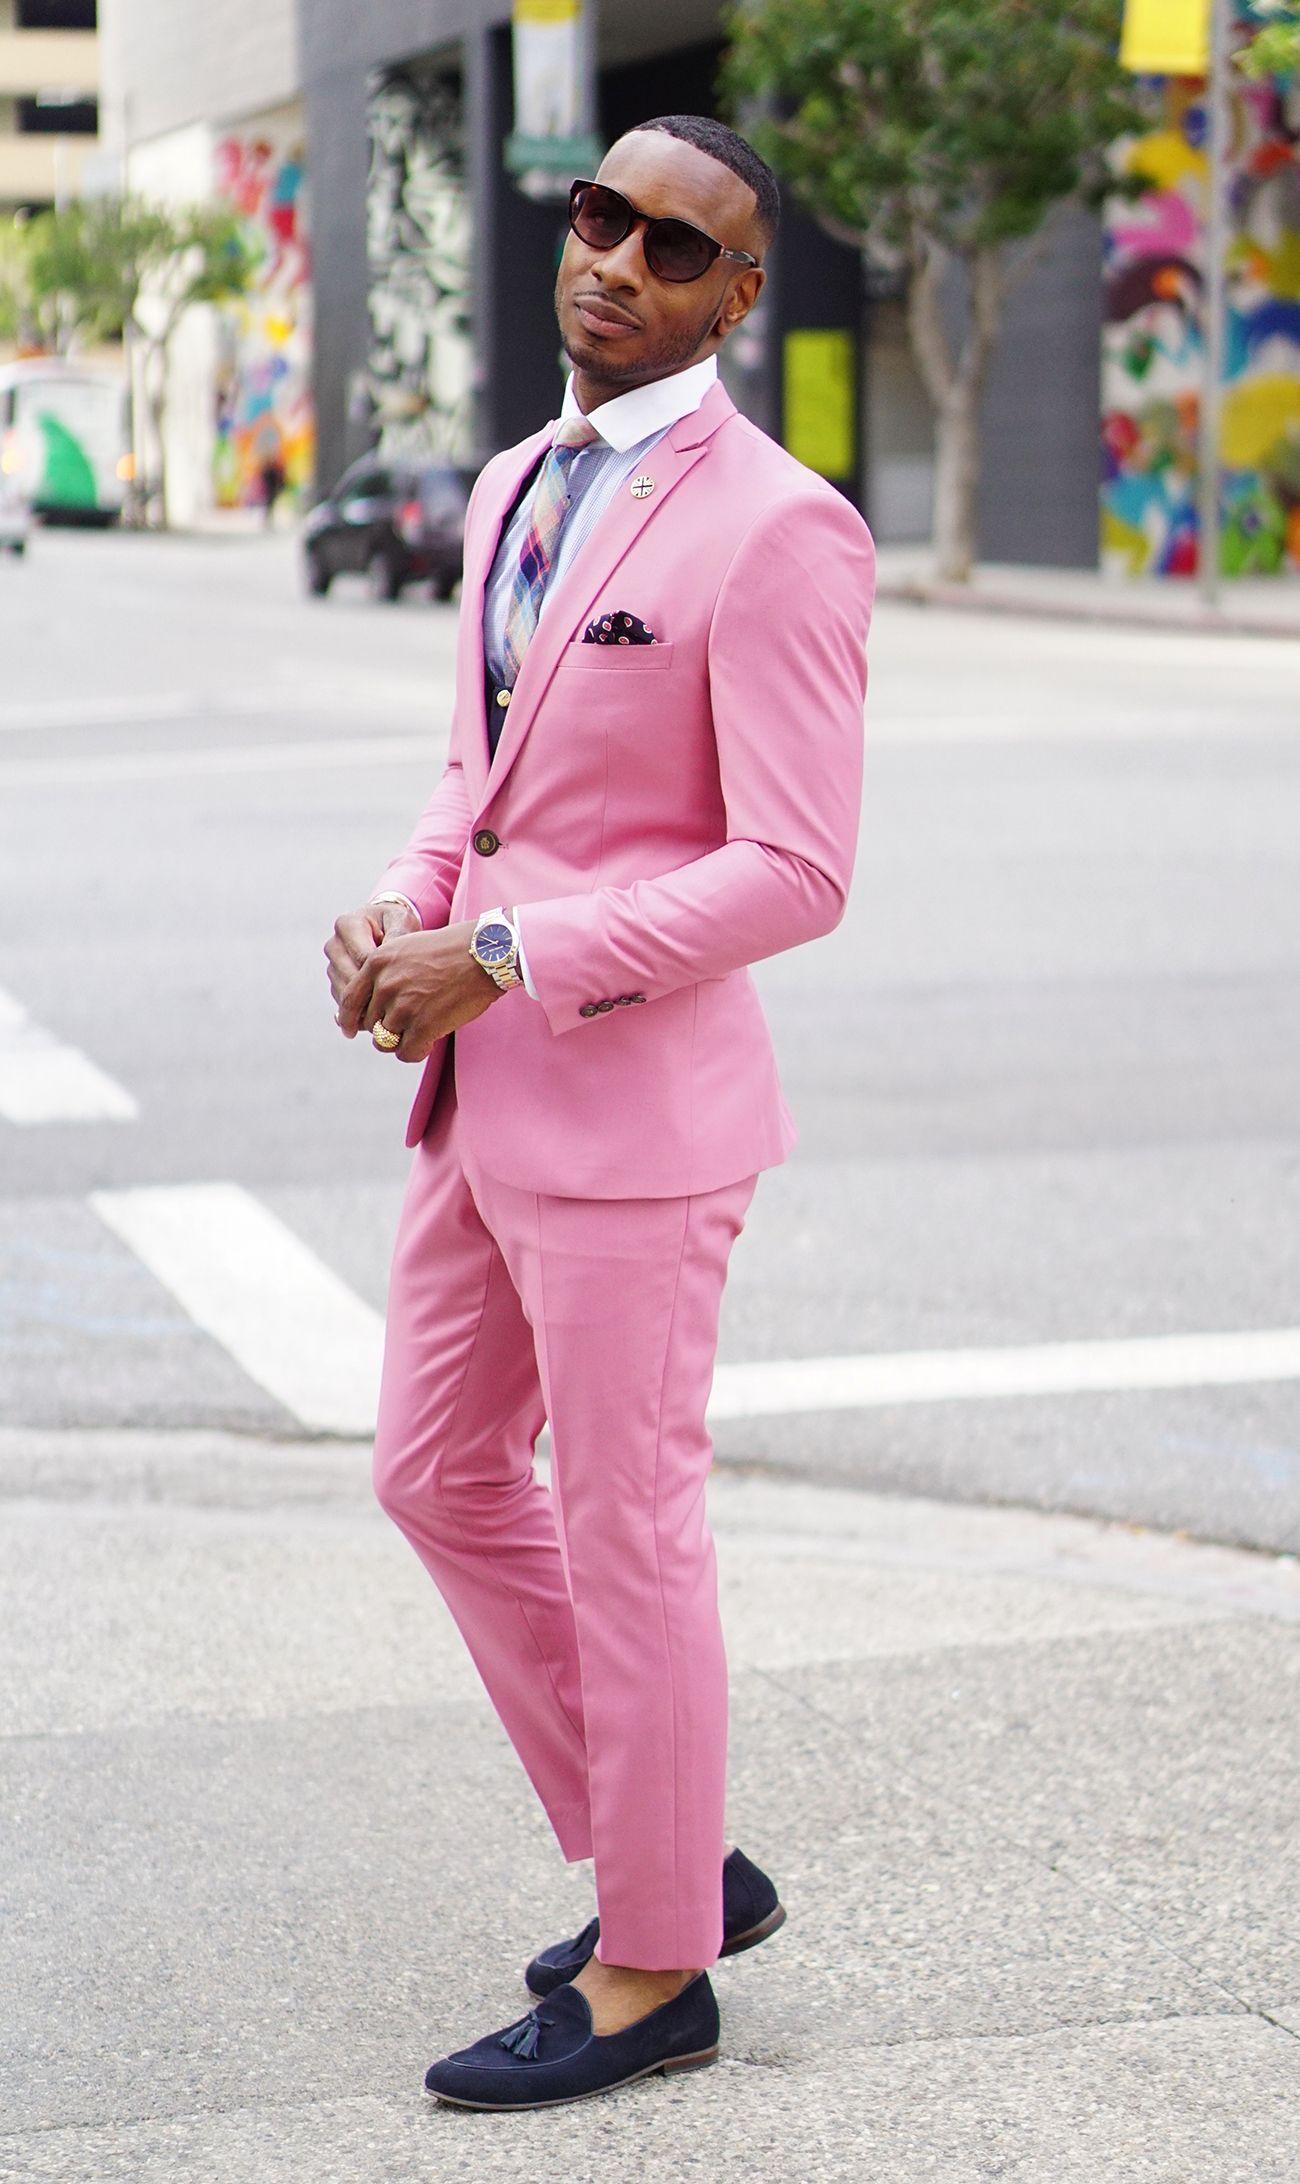 Latest Coat Pant Design Hot Pink Men Suit Jacket Slim Fit Skinny 2 Piece Casual Blazer Custom Groom Tuxedo lino Jacket+Pant+Vest